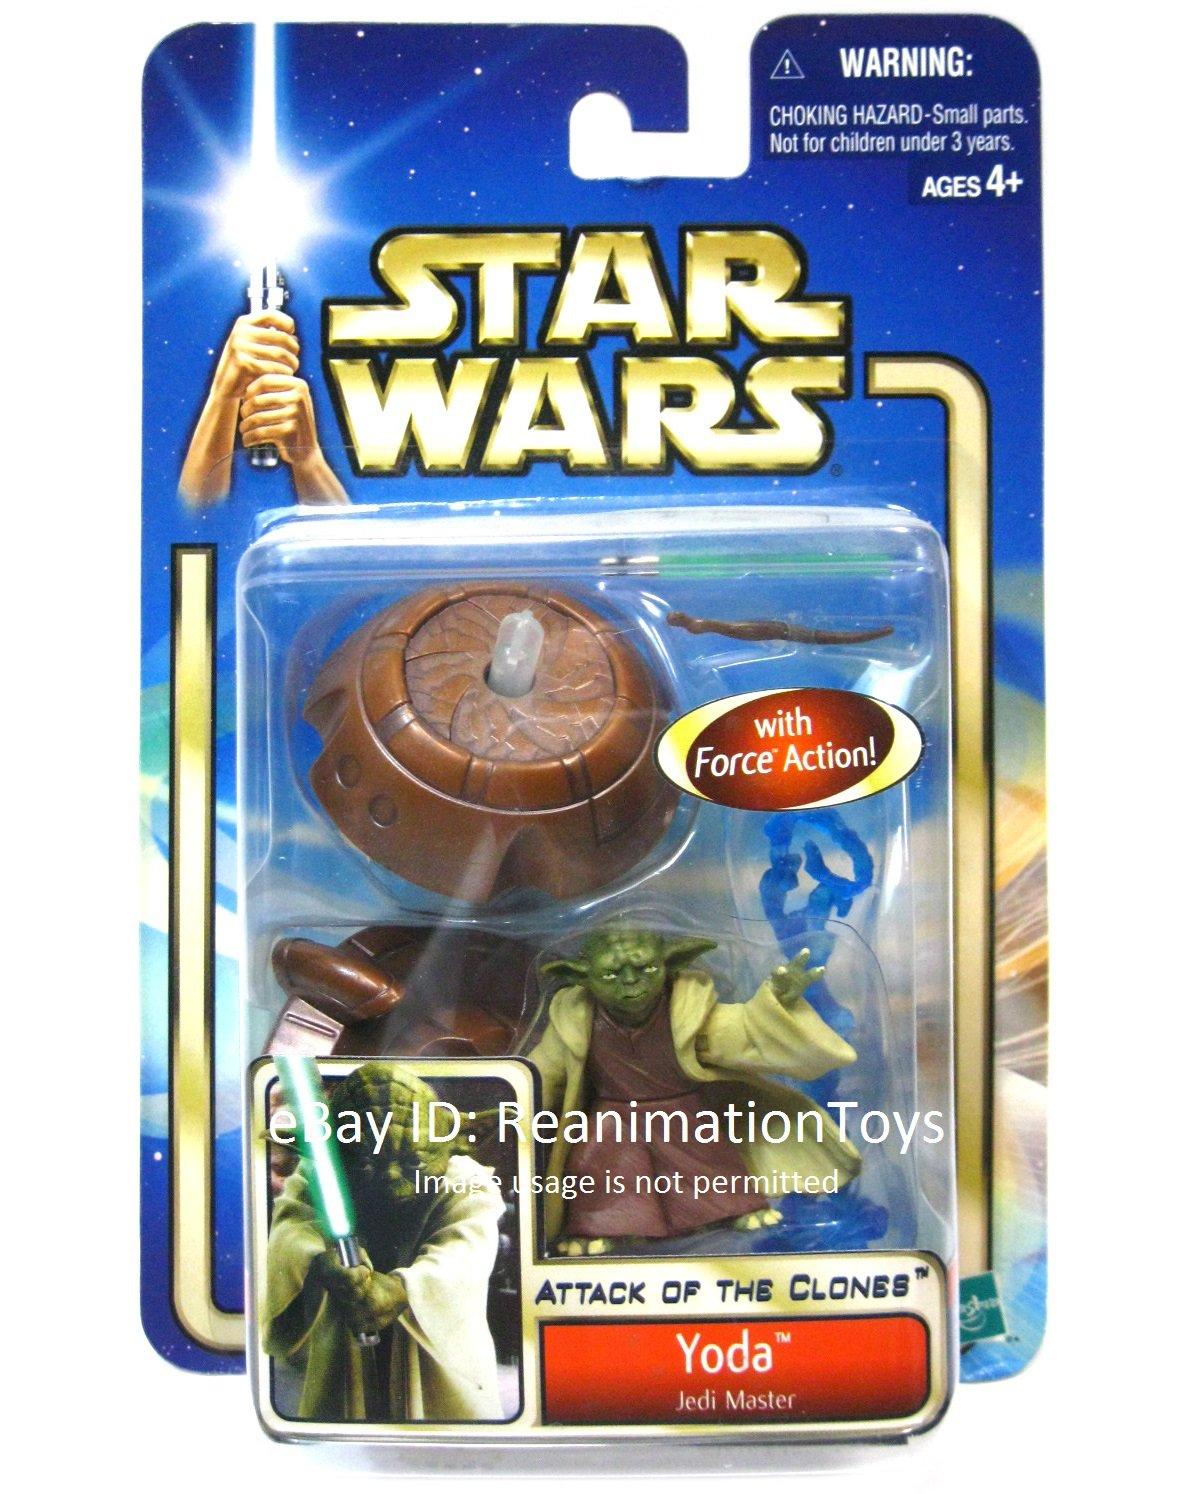 Star Wars Saga Attack of the Clones AOTC Yoda Jedi Master MOC